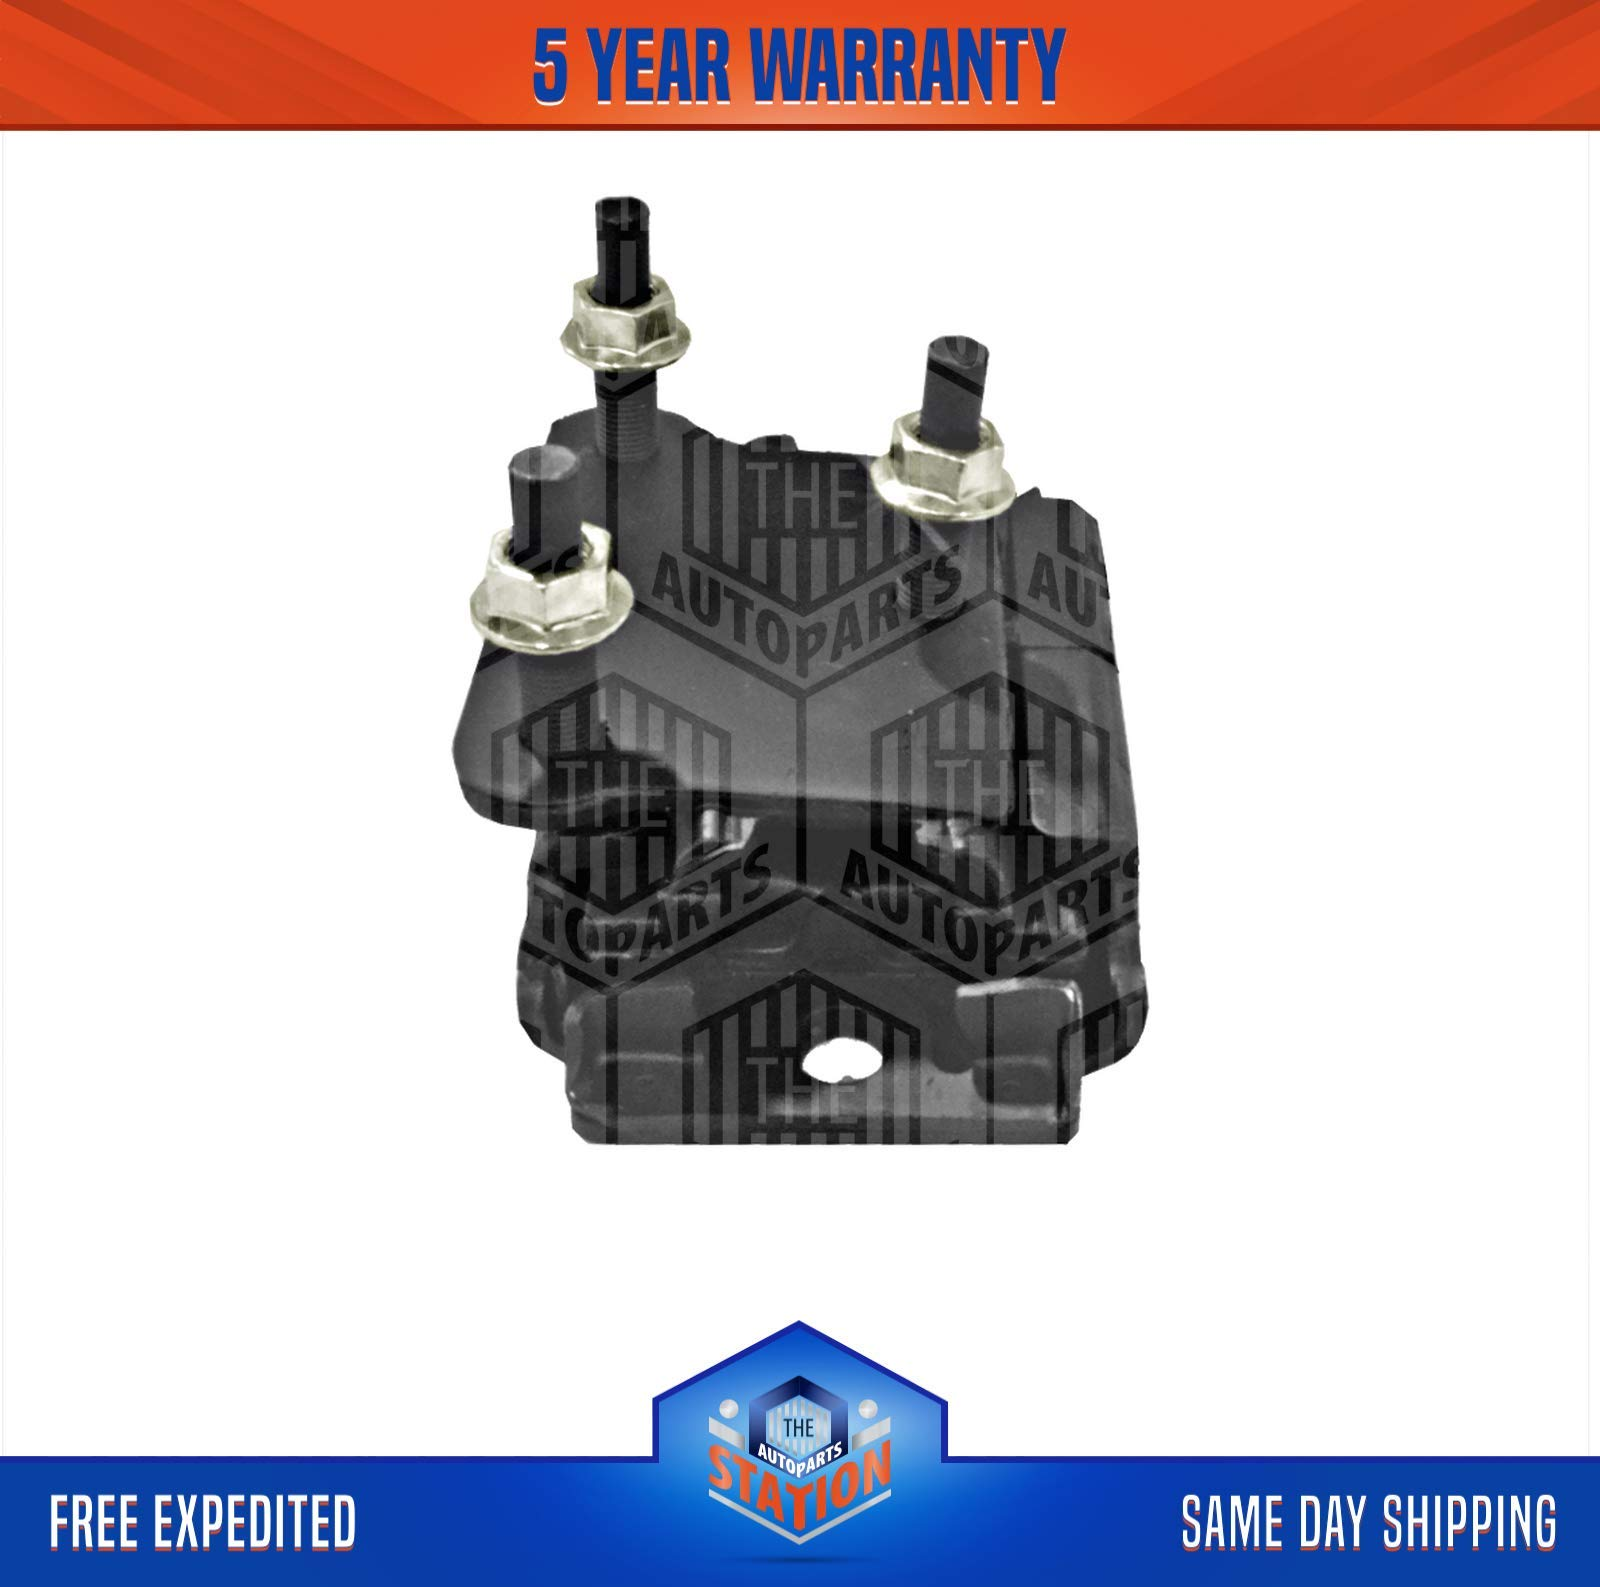 Eagle BHP 3463 Transmission Motor Mount (4.0 For Nissan Frontier 4x4)